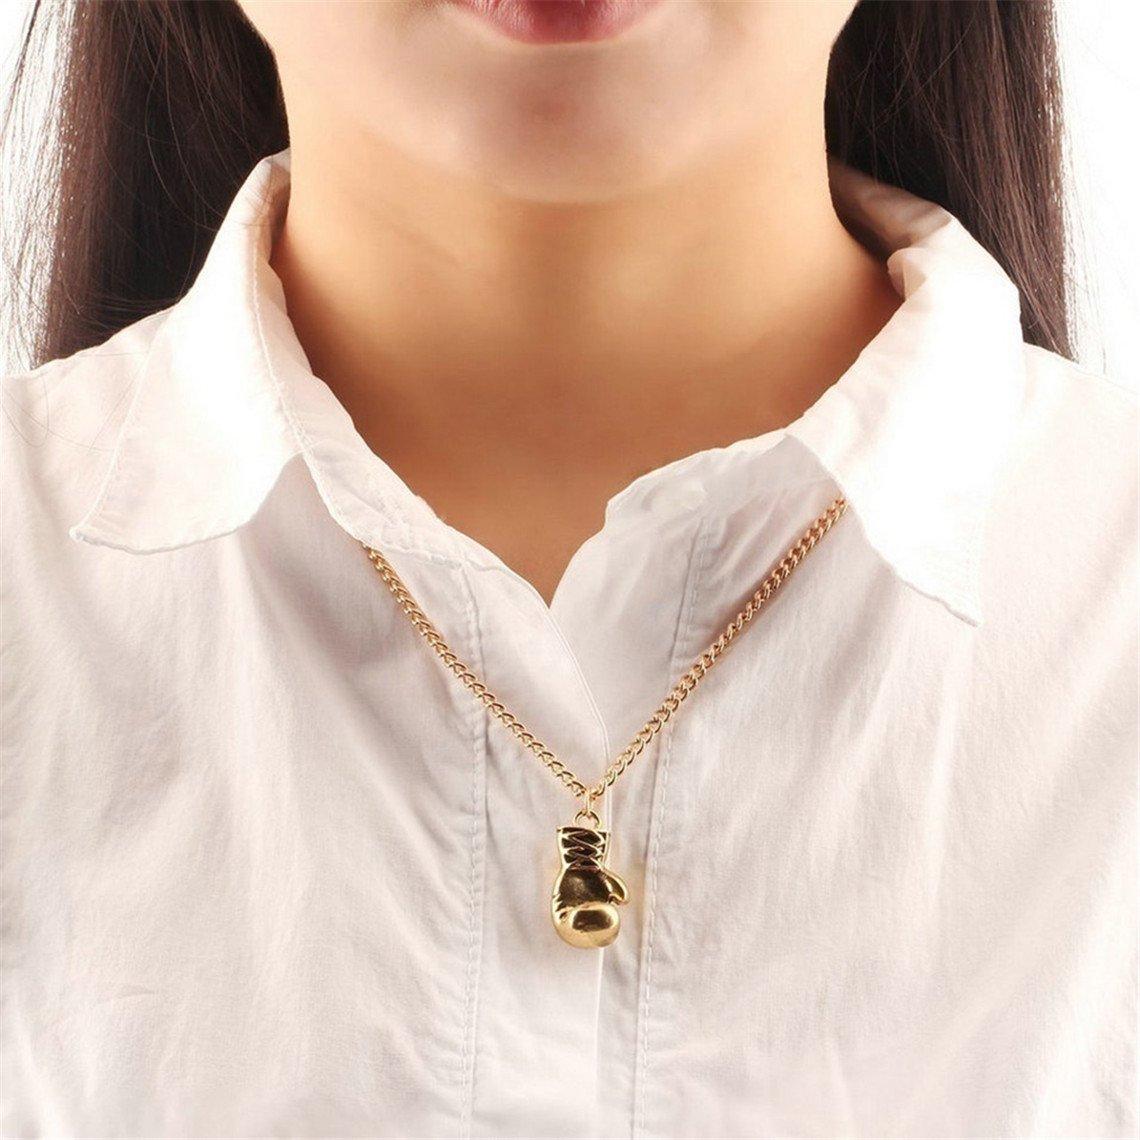 Rurah Men Women Boxing Glove Chain Pendant Necklace Boxing Gloves Shaped Pendant Necklace,Golden